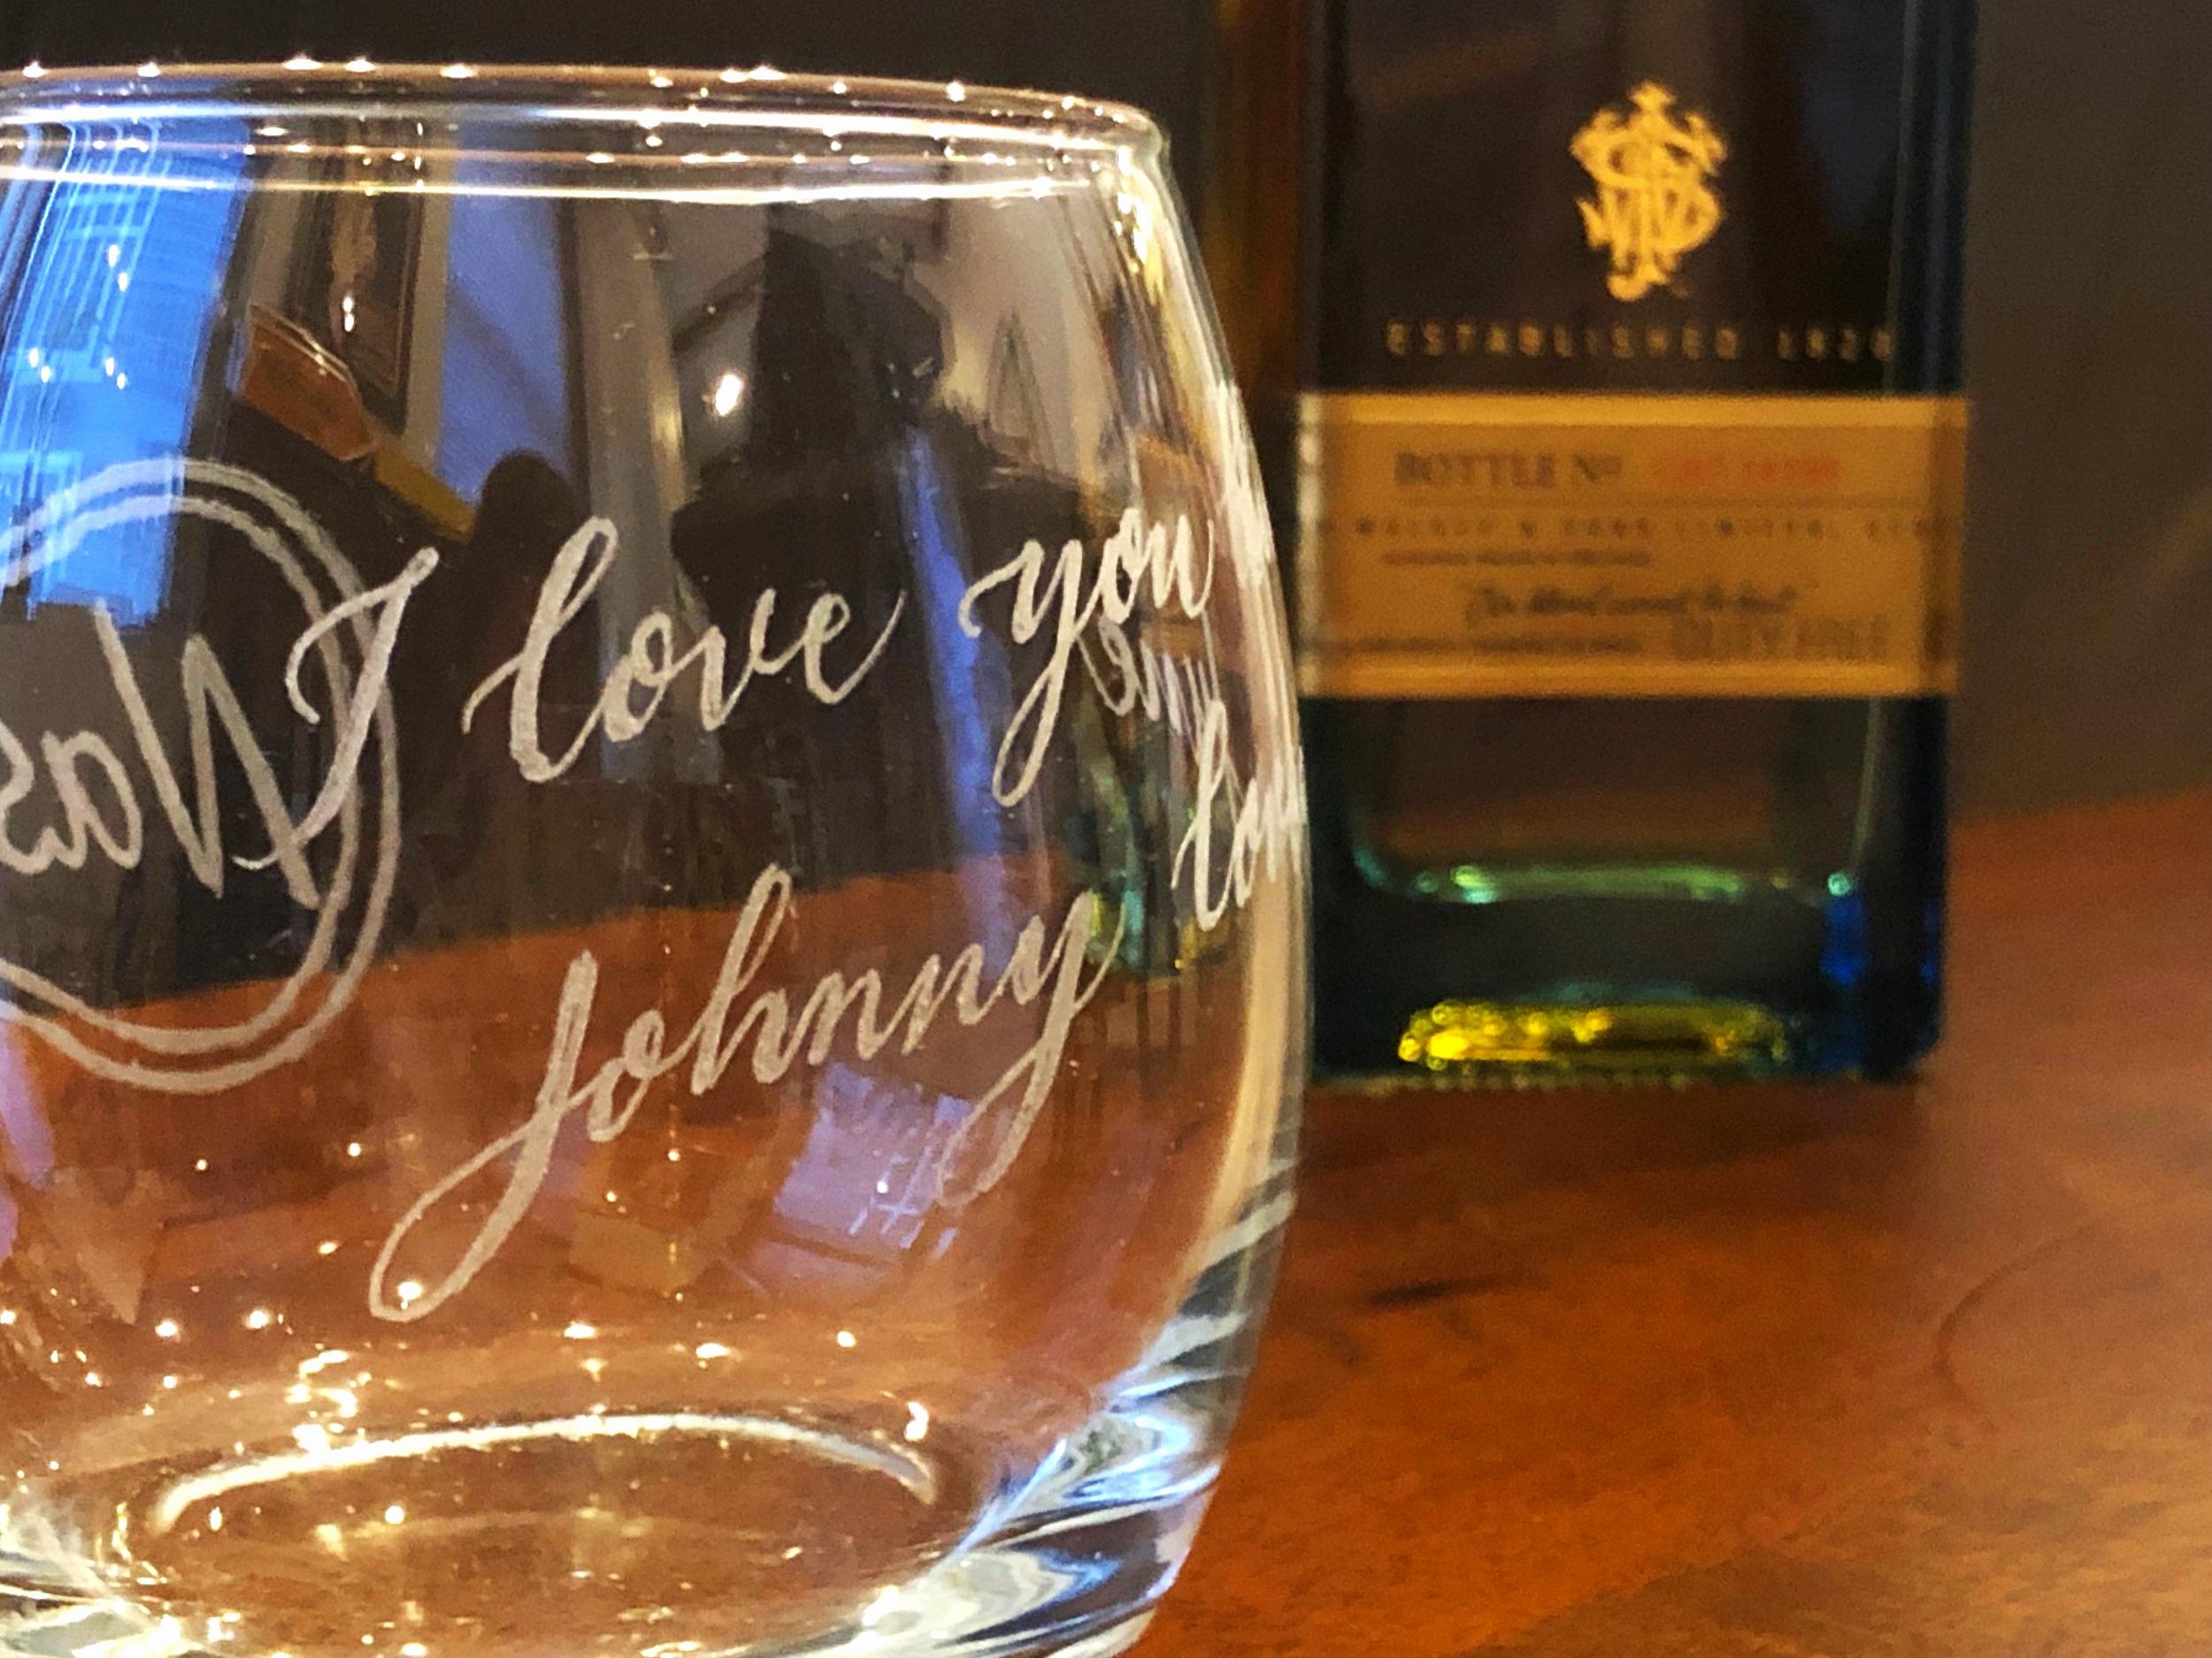 engraving_nash glass.JPG